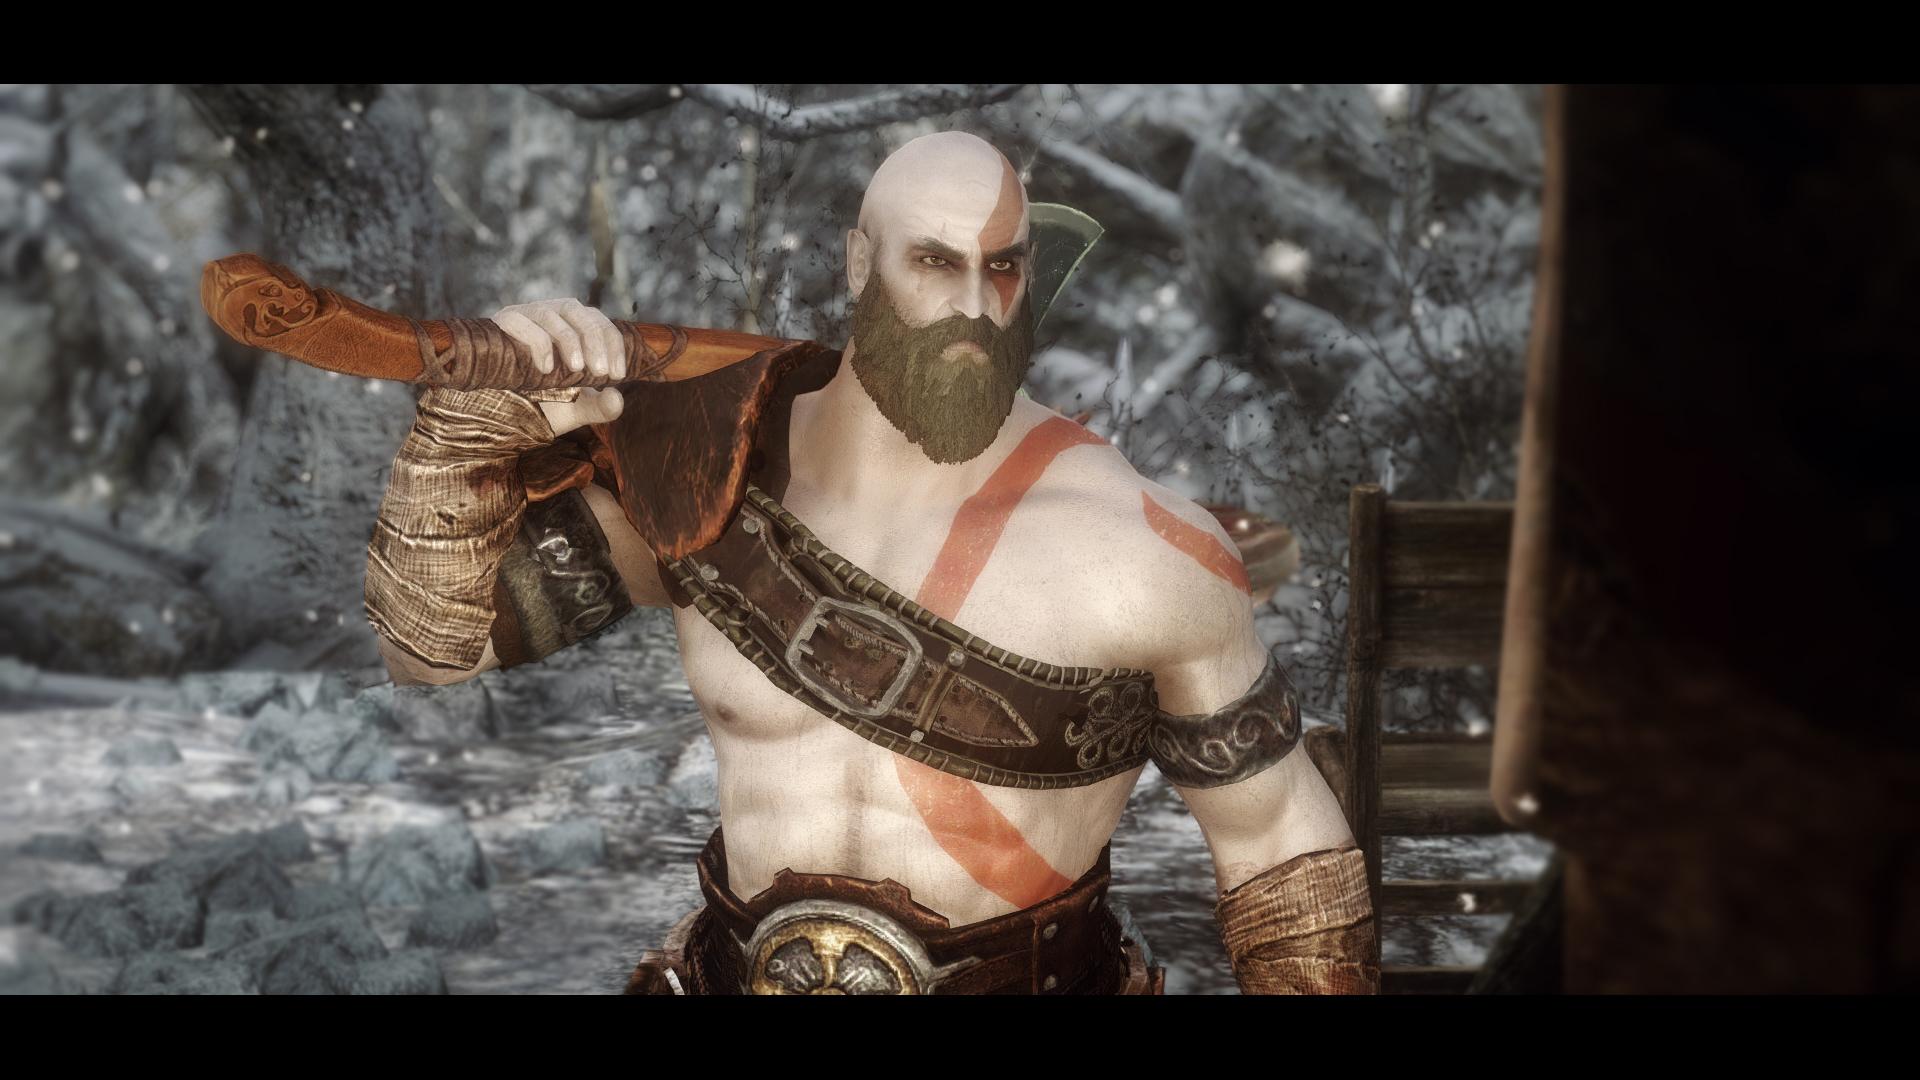 PC Skyrim God of War Mod Released